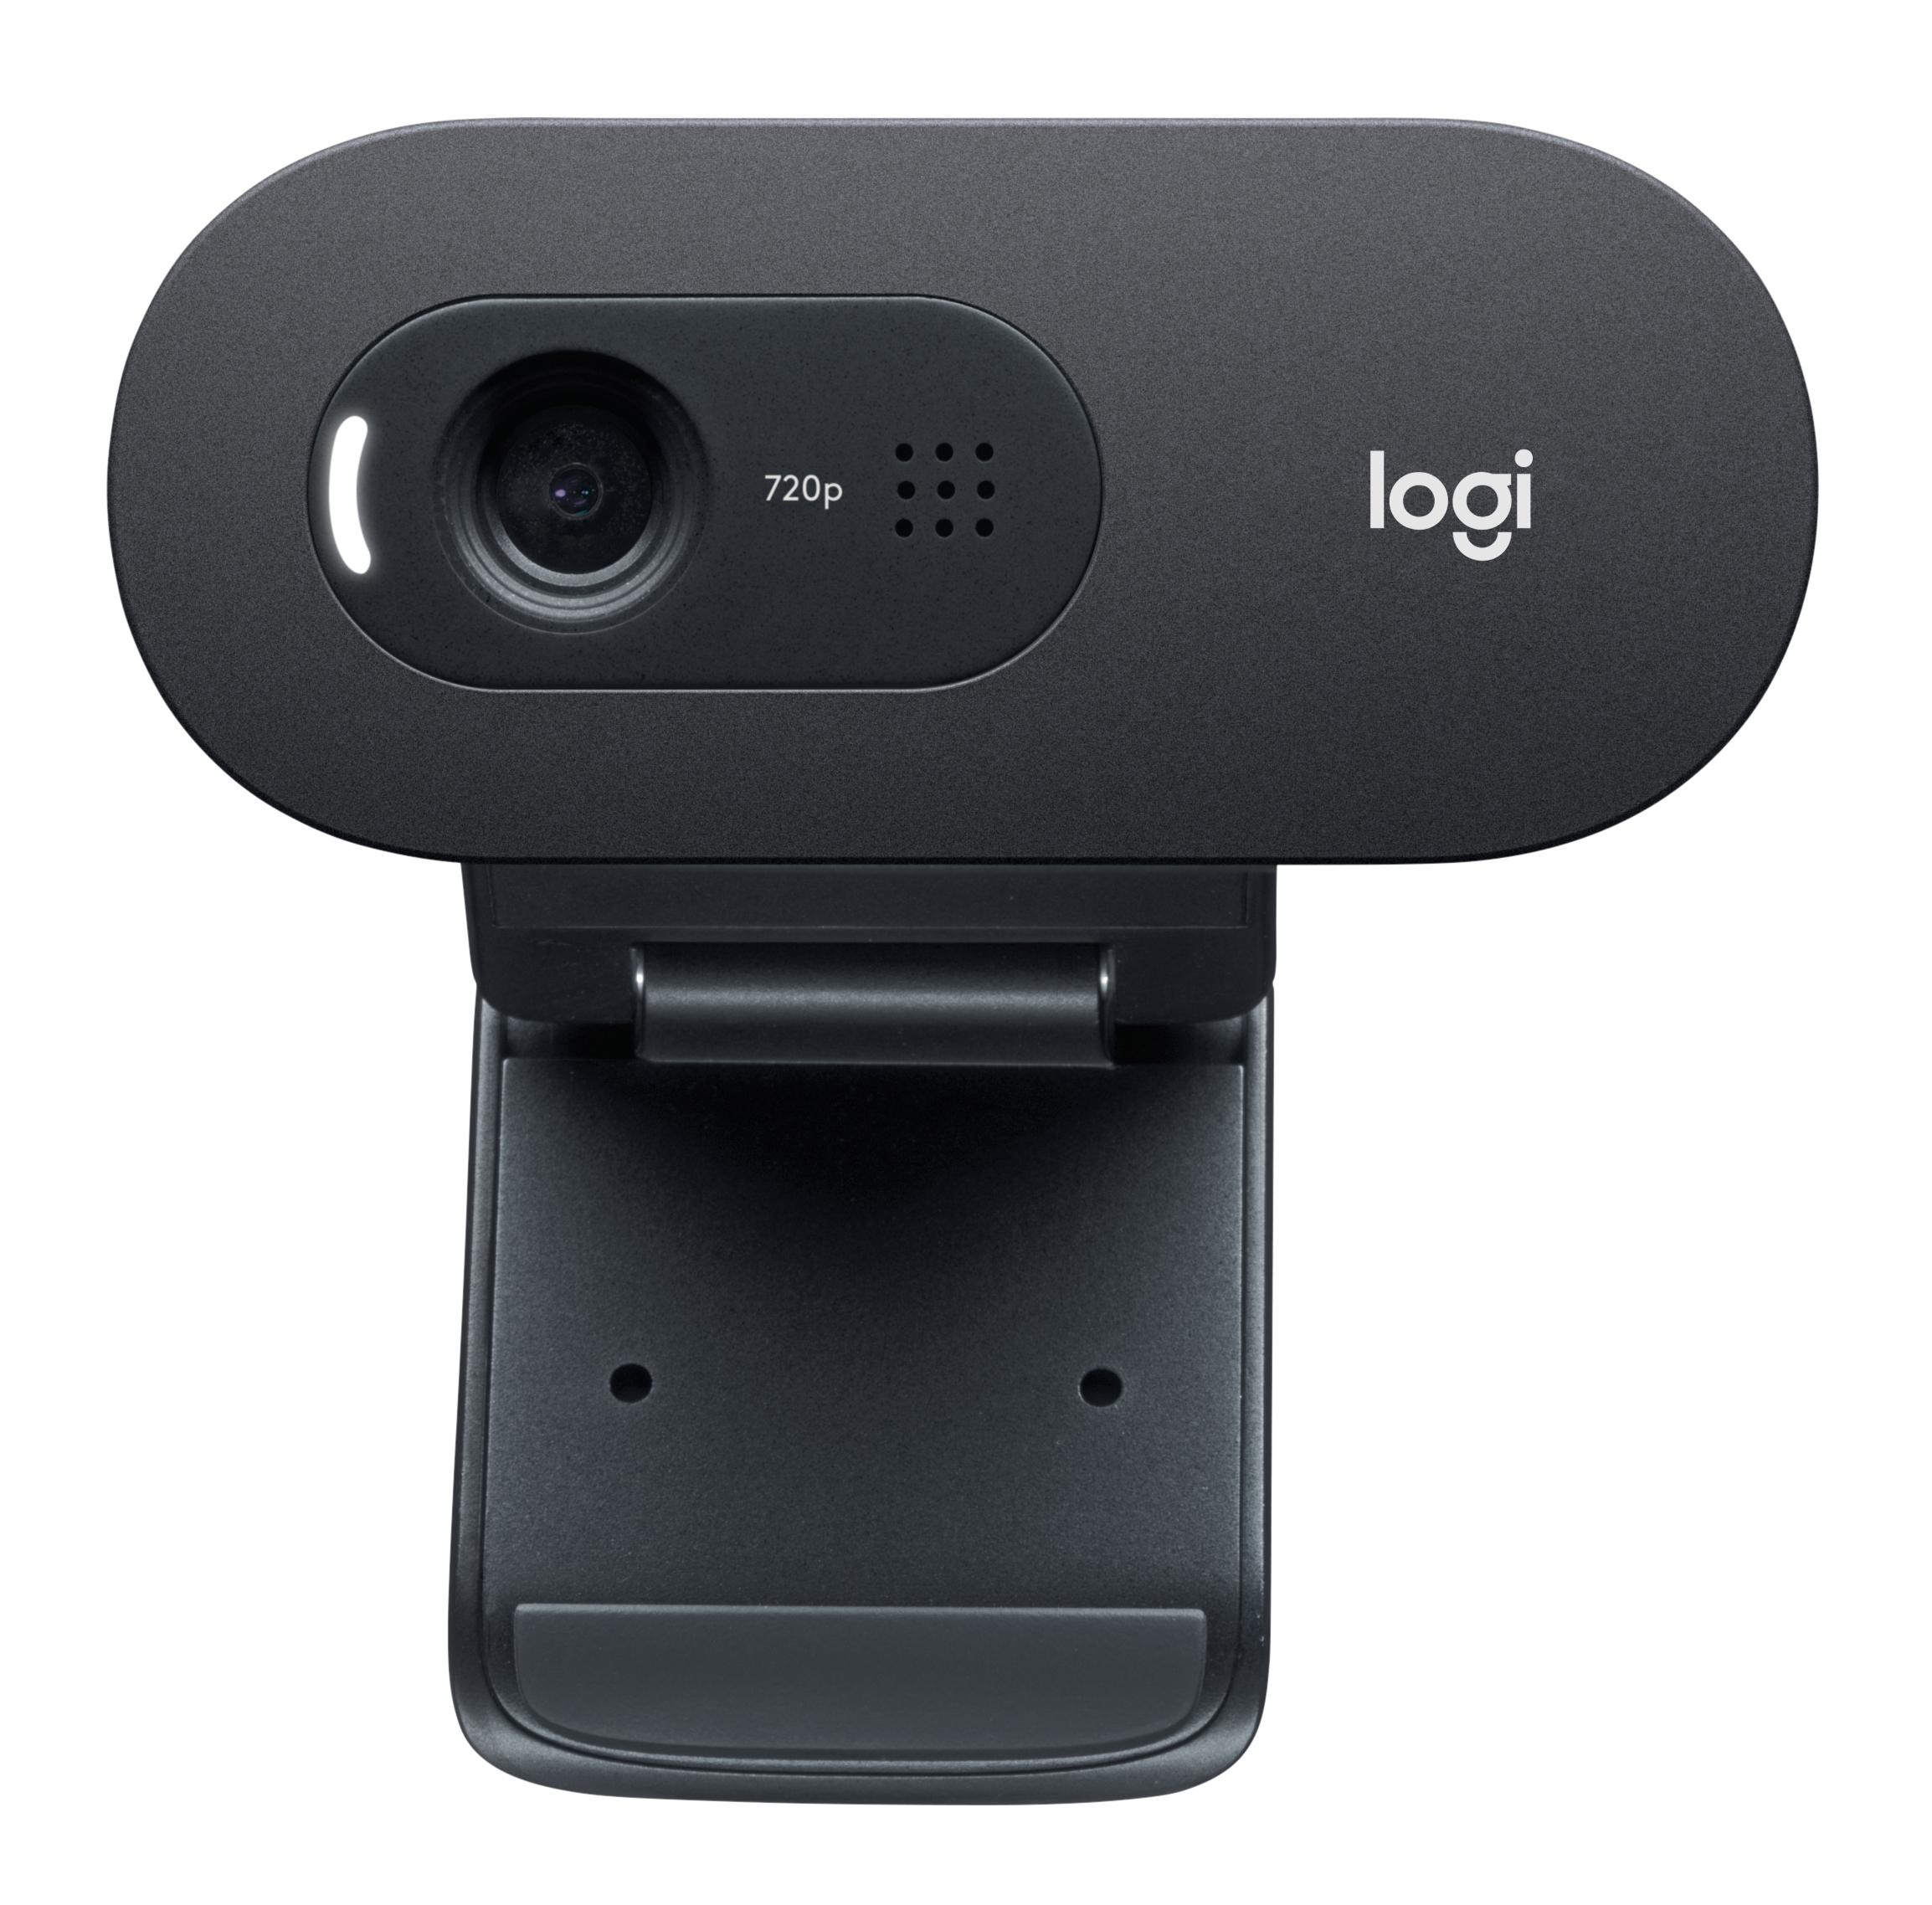 Logitech C505e - 1280 x 720 Pixel - 30 fps - 1280x720@30fps - 720p - 60° - USB